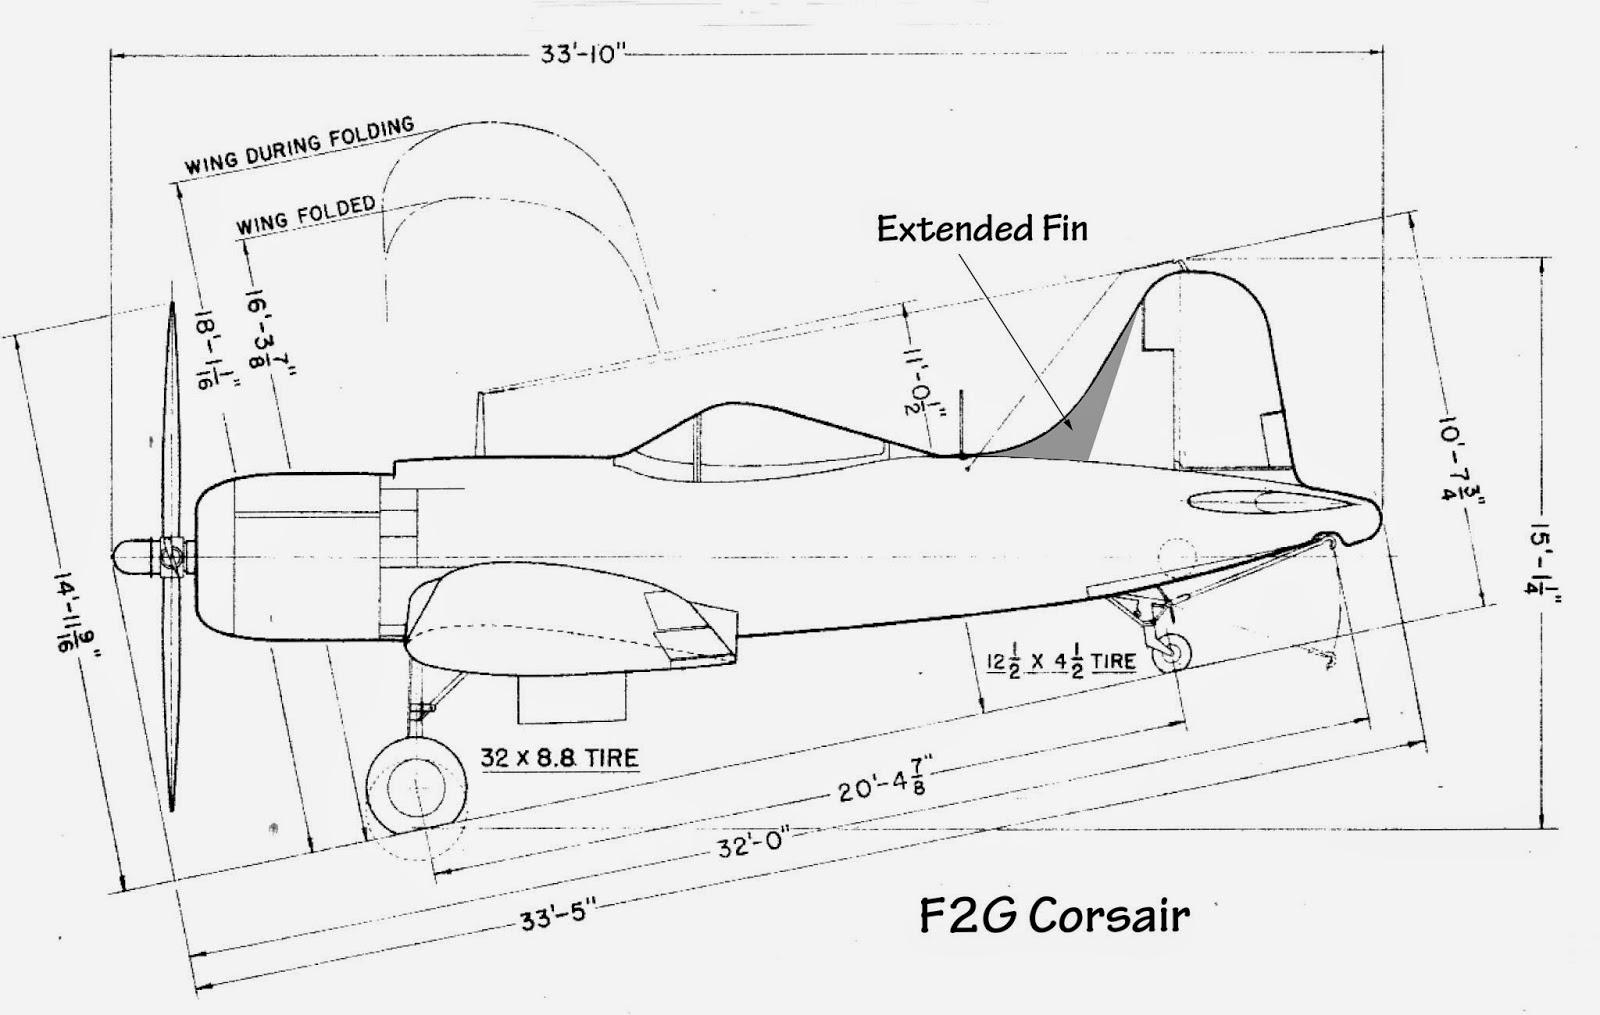 U S Navy Aircraft History Goodyear F2g Corsair Kamikaze